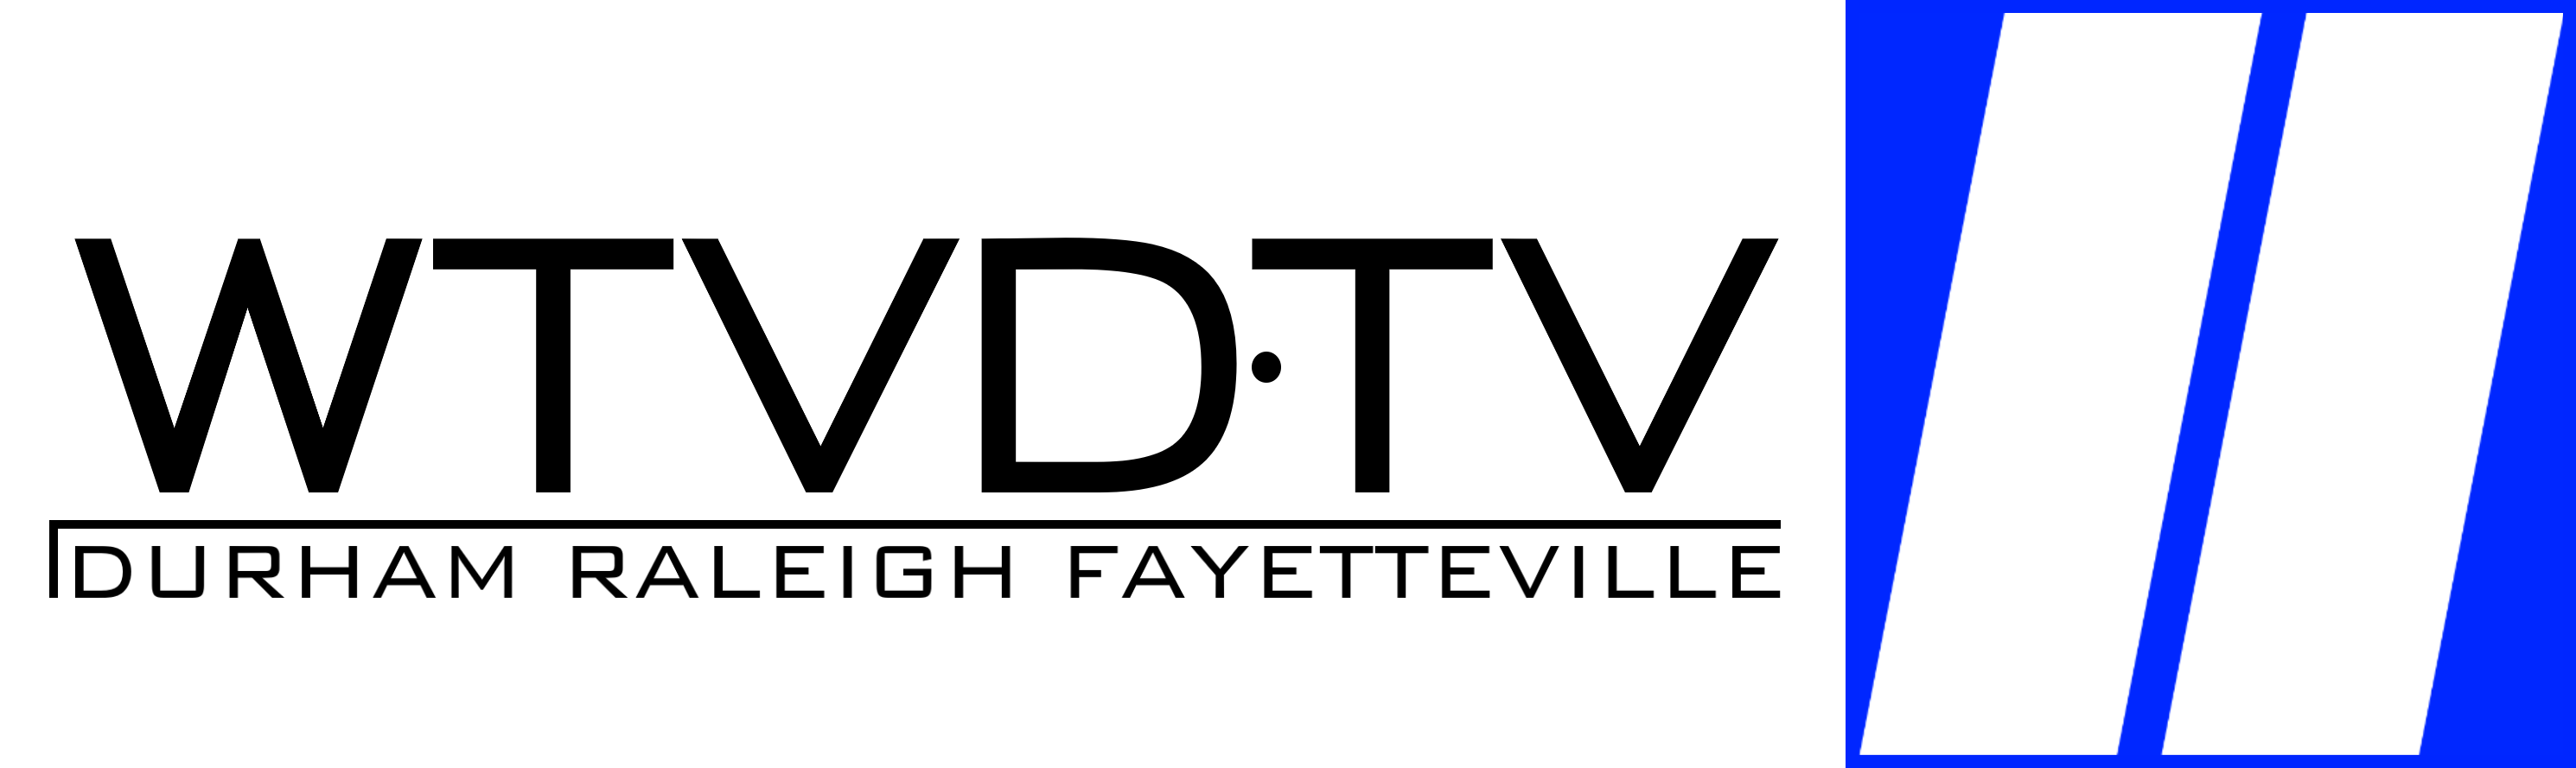 AlternateHistory.com's WTVD logo #1.png